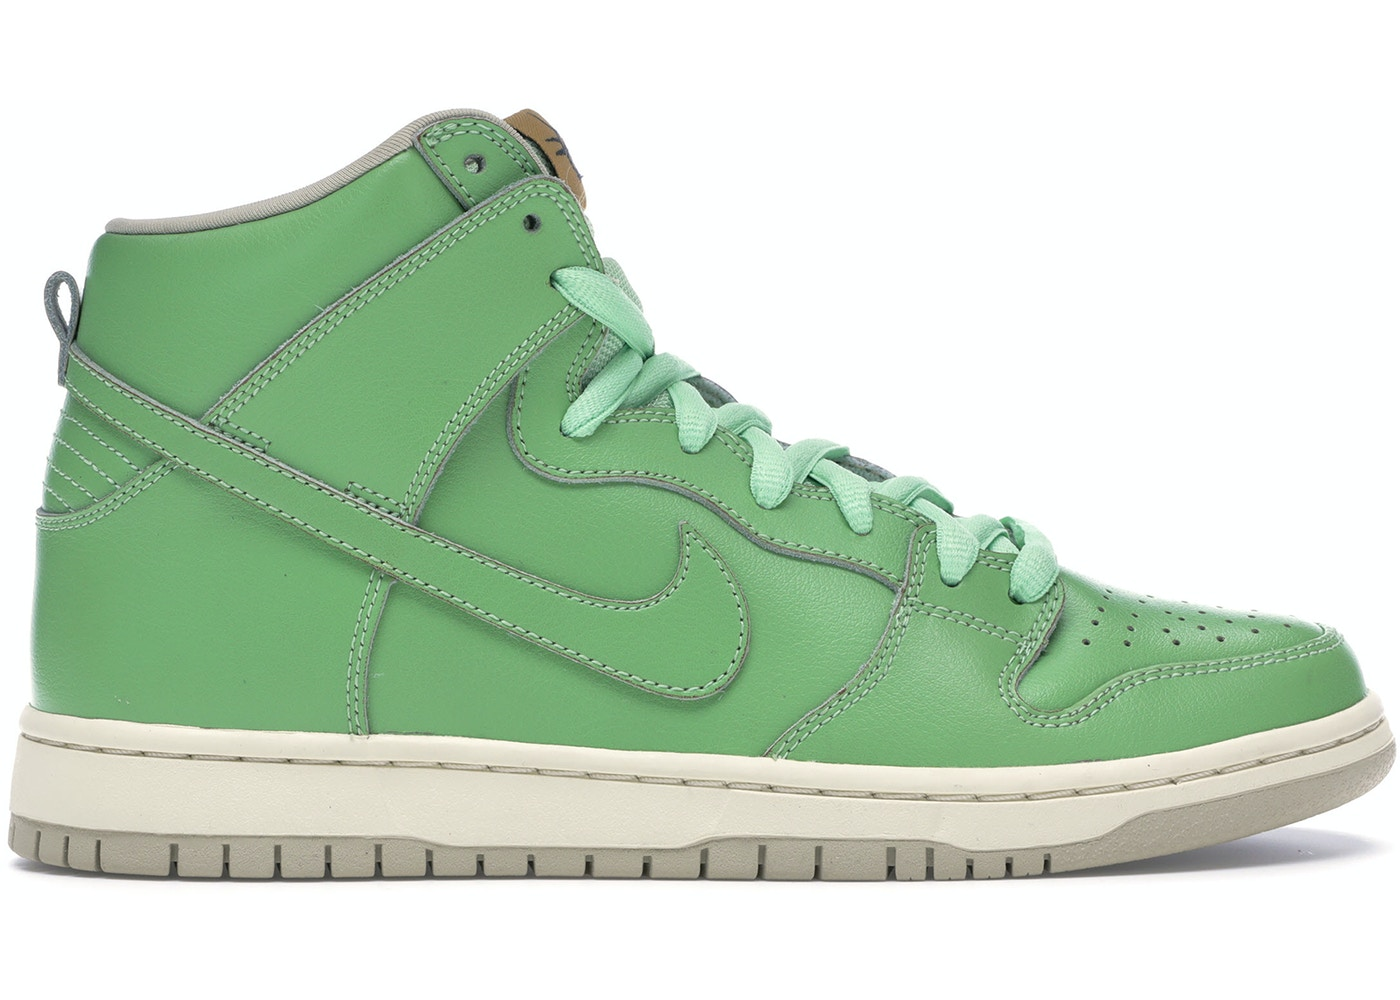 online store a118e 9cd25 Nike Dunk SB High Statue of Liberty